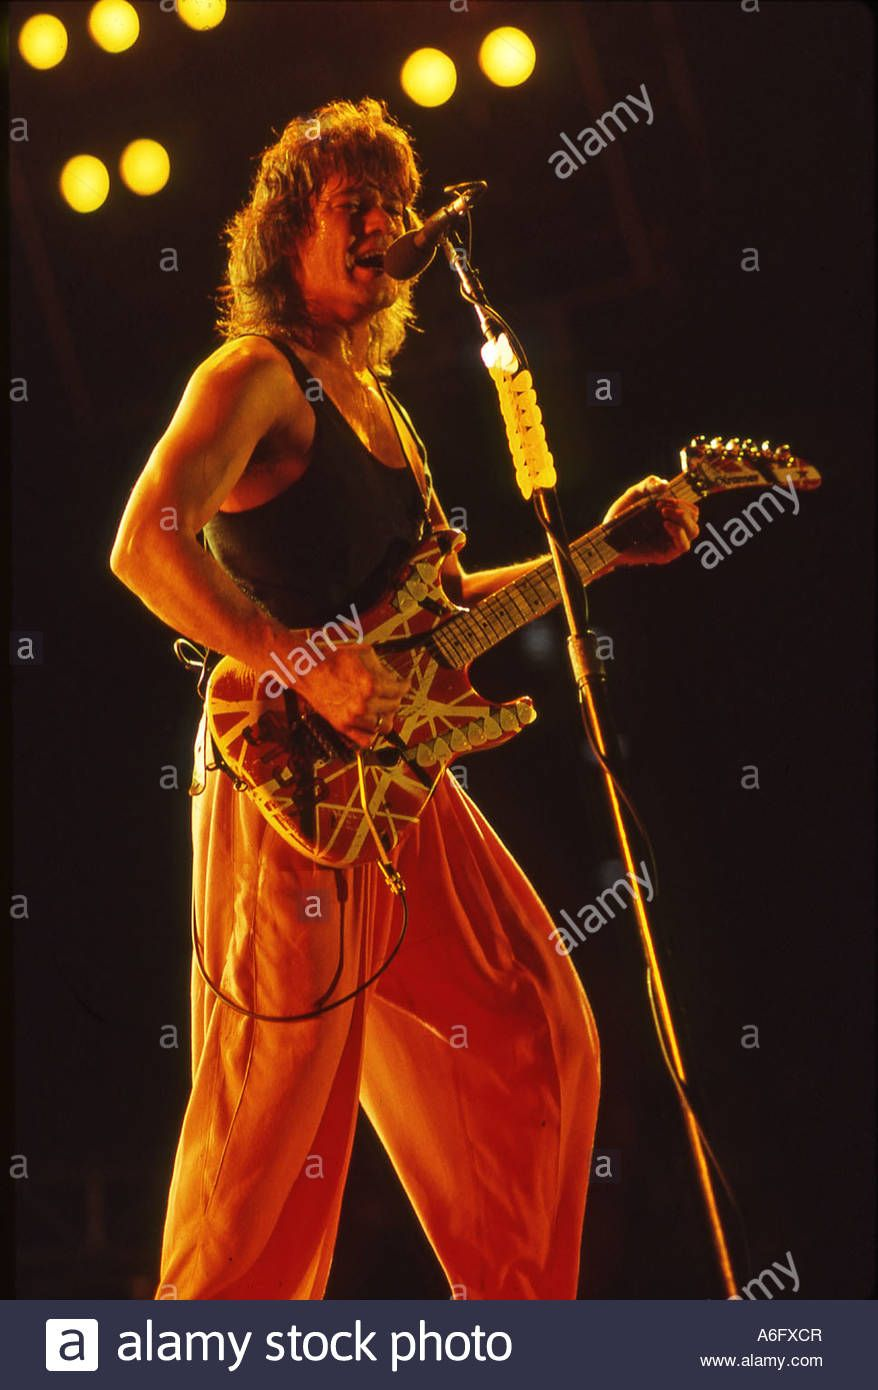 Pin By Luca Ferrara On Eddie Van Halen Eddie Van Halen Van Halen Red Rocker